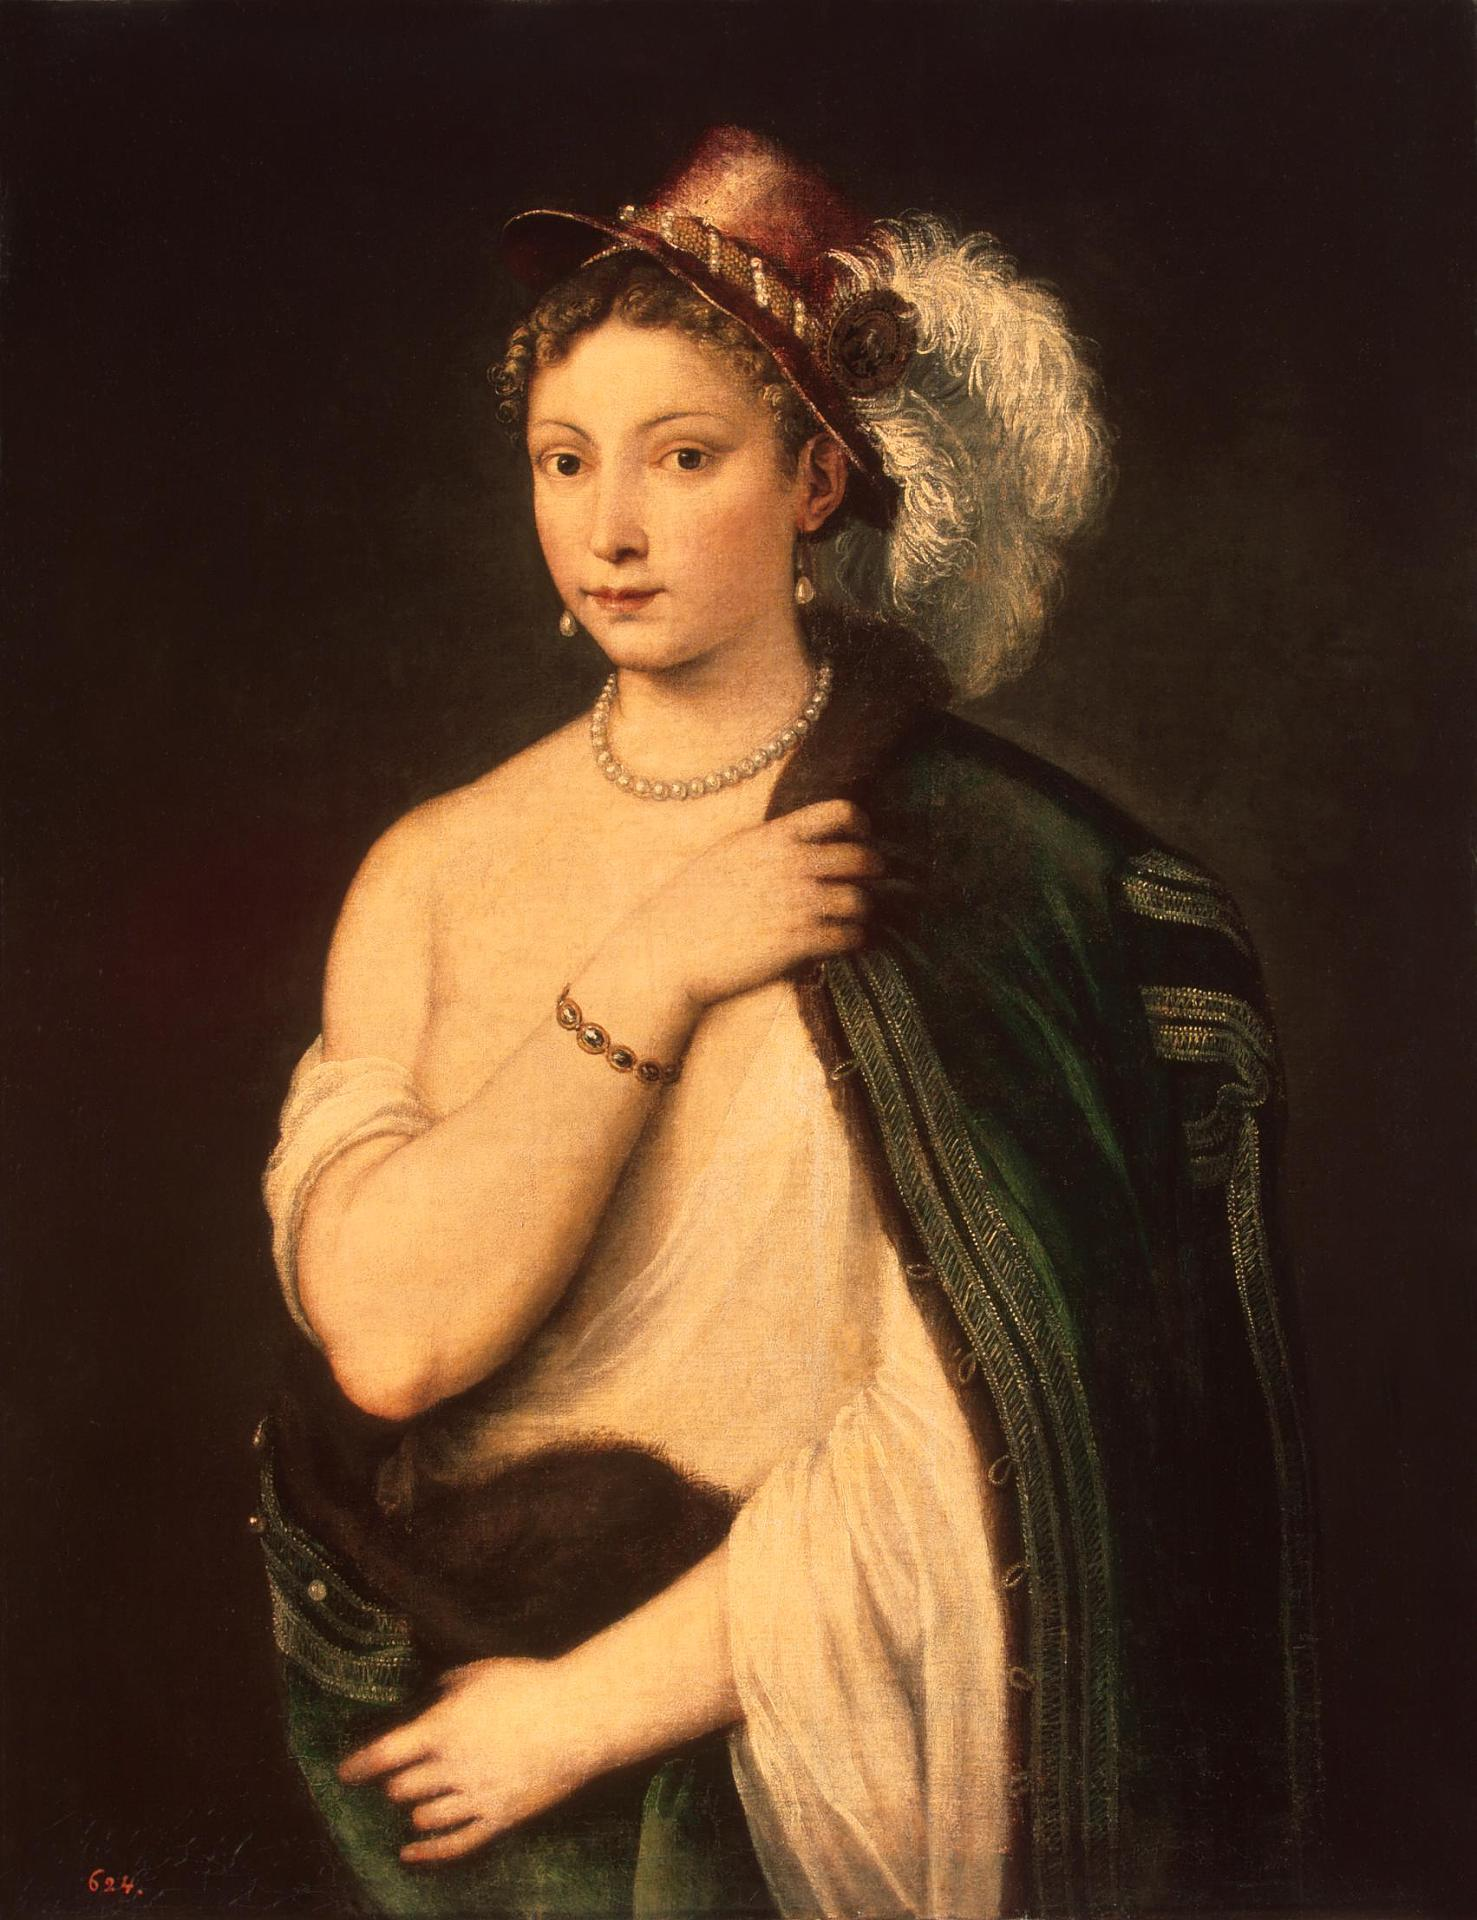 Портрет молодой женщины Тициан около 1536 Эрмитаж